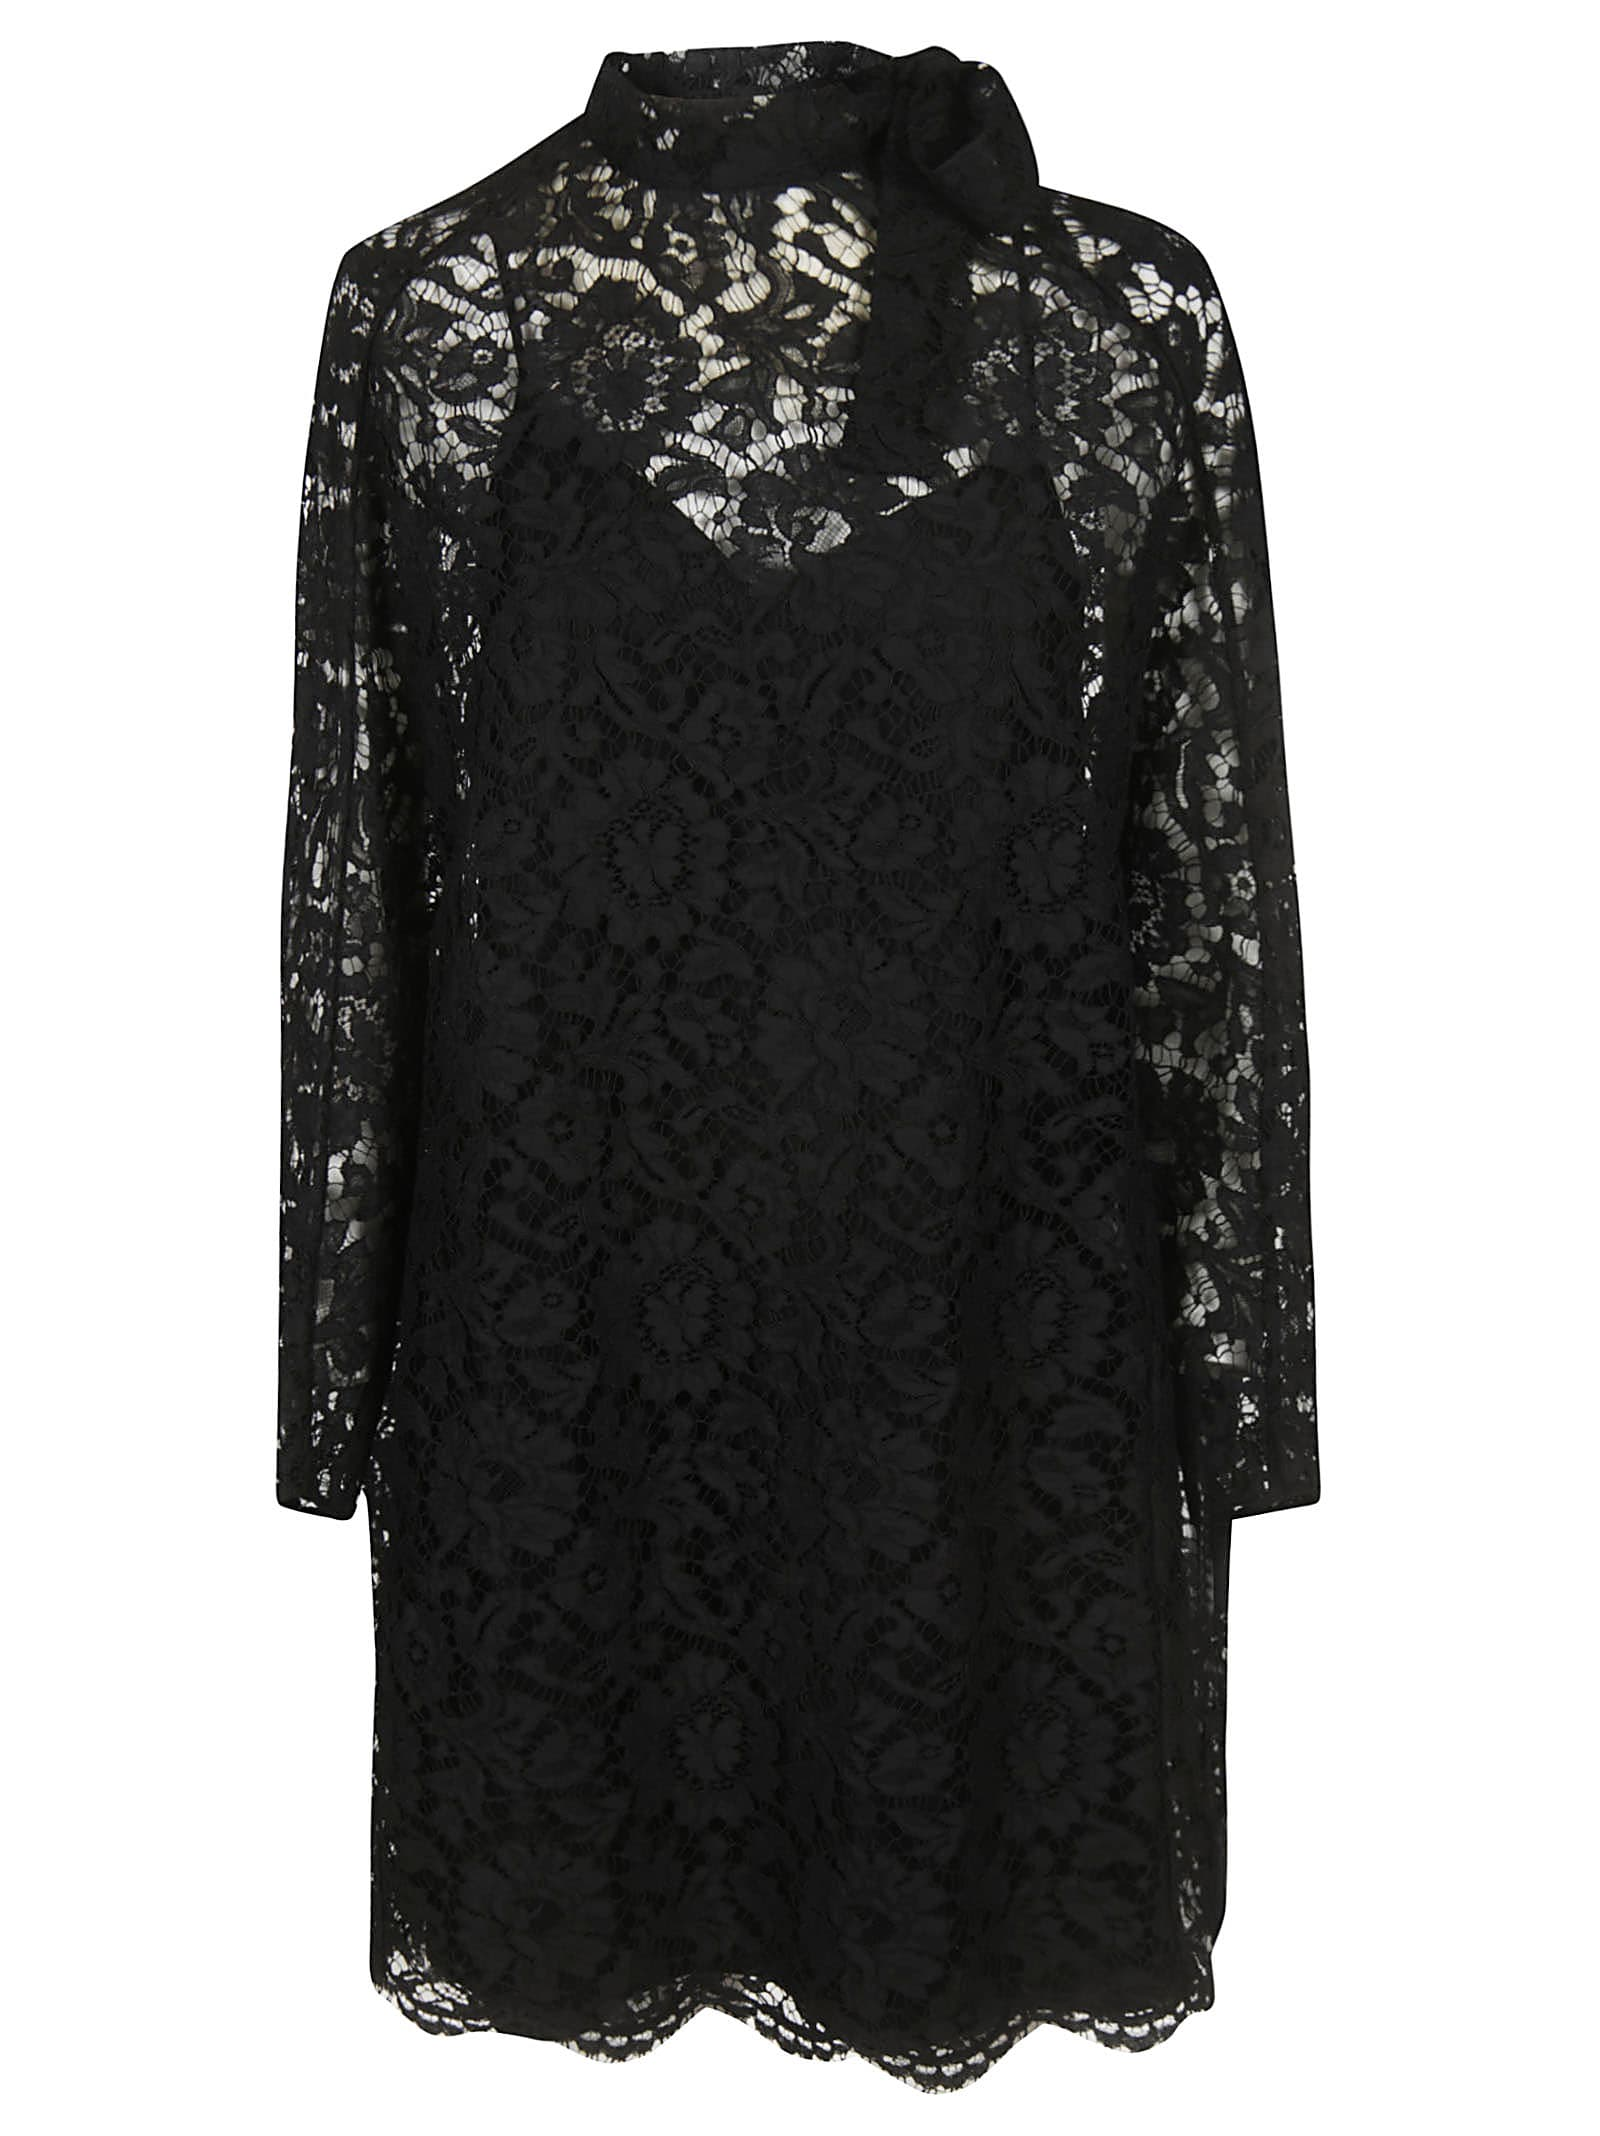 Valentino Laced Dress